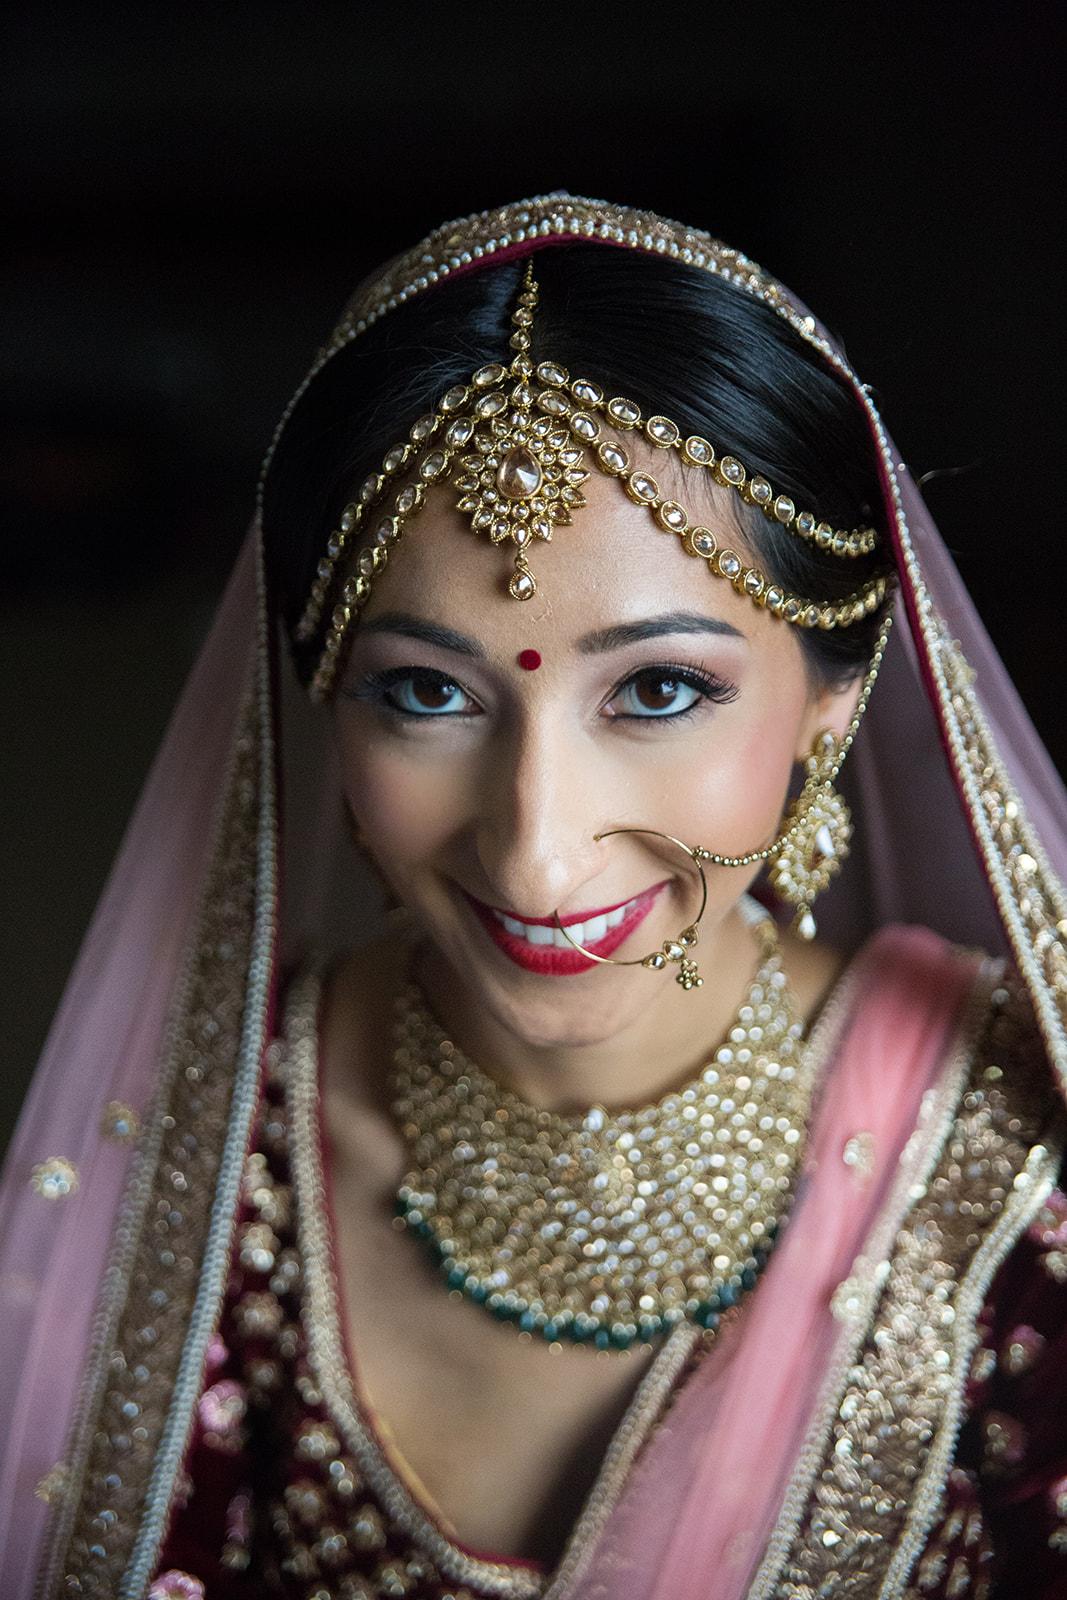 Le Cape Weddings - Puja and Kheelan - Getting Ready Bride -91.jpg